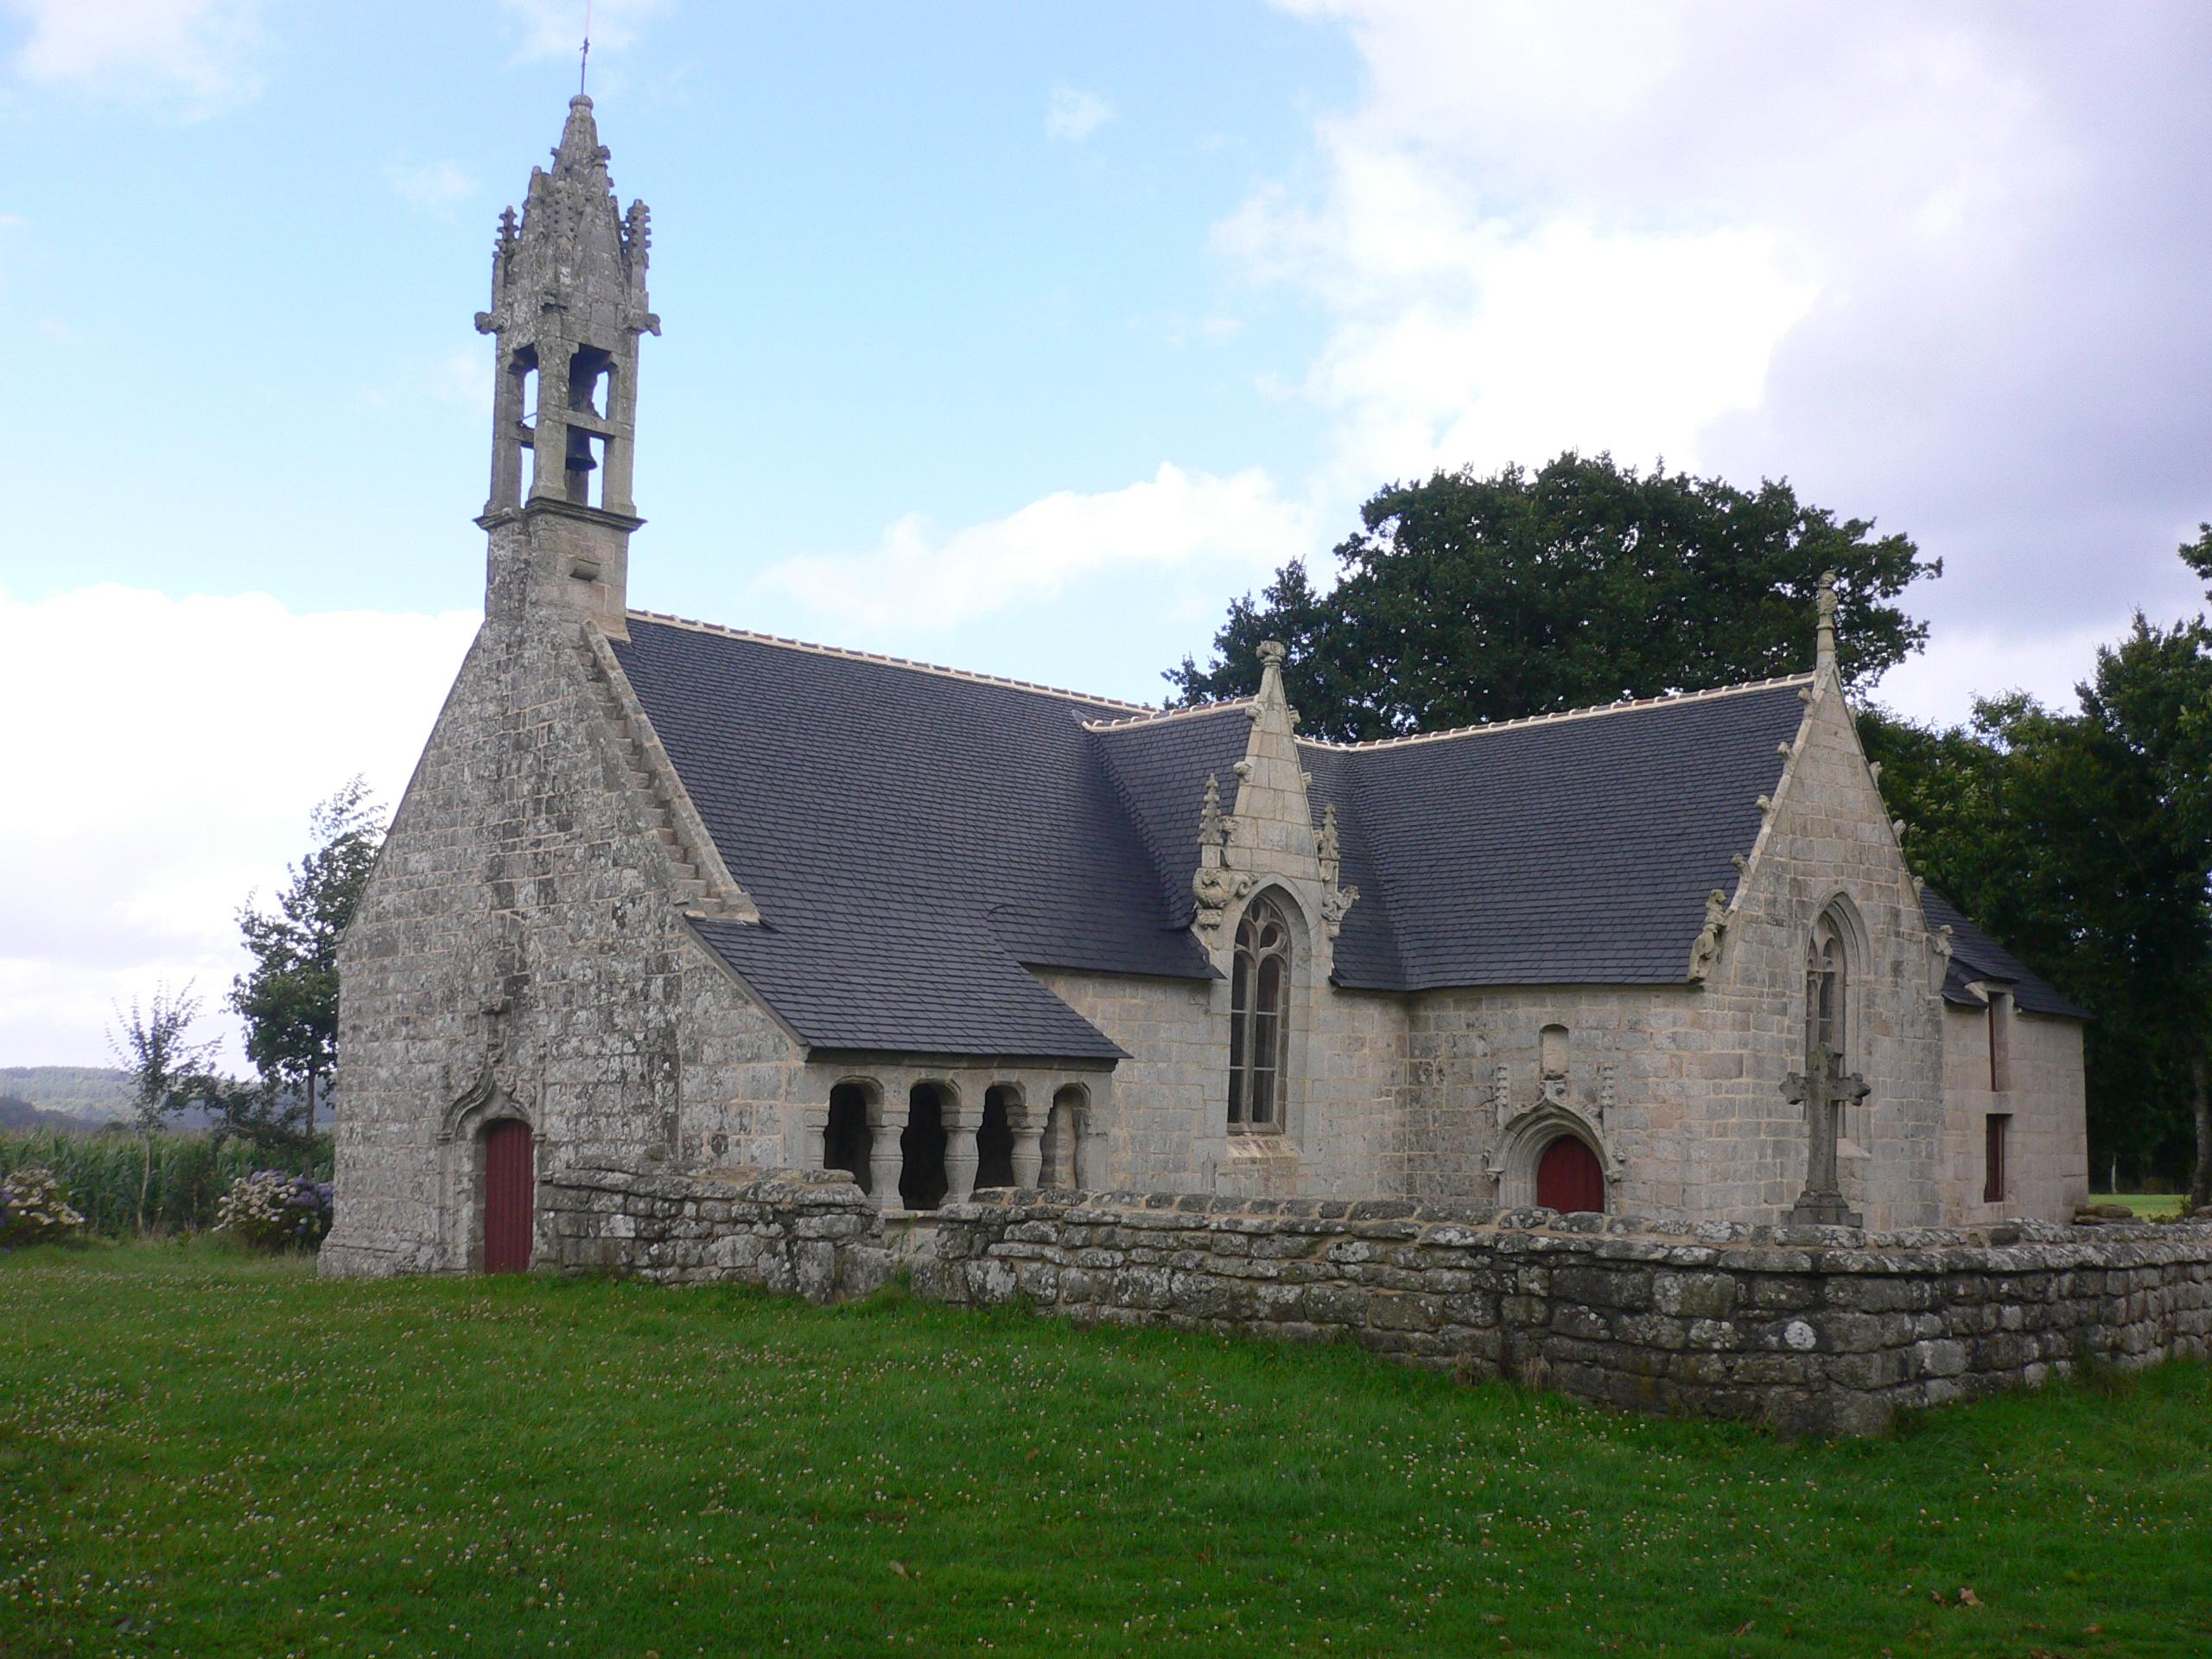 Saint-Tugdual